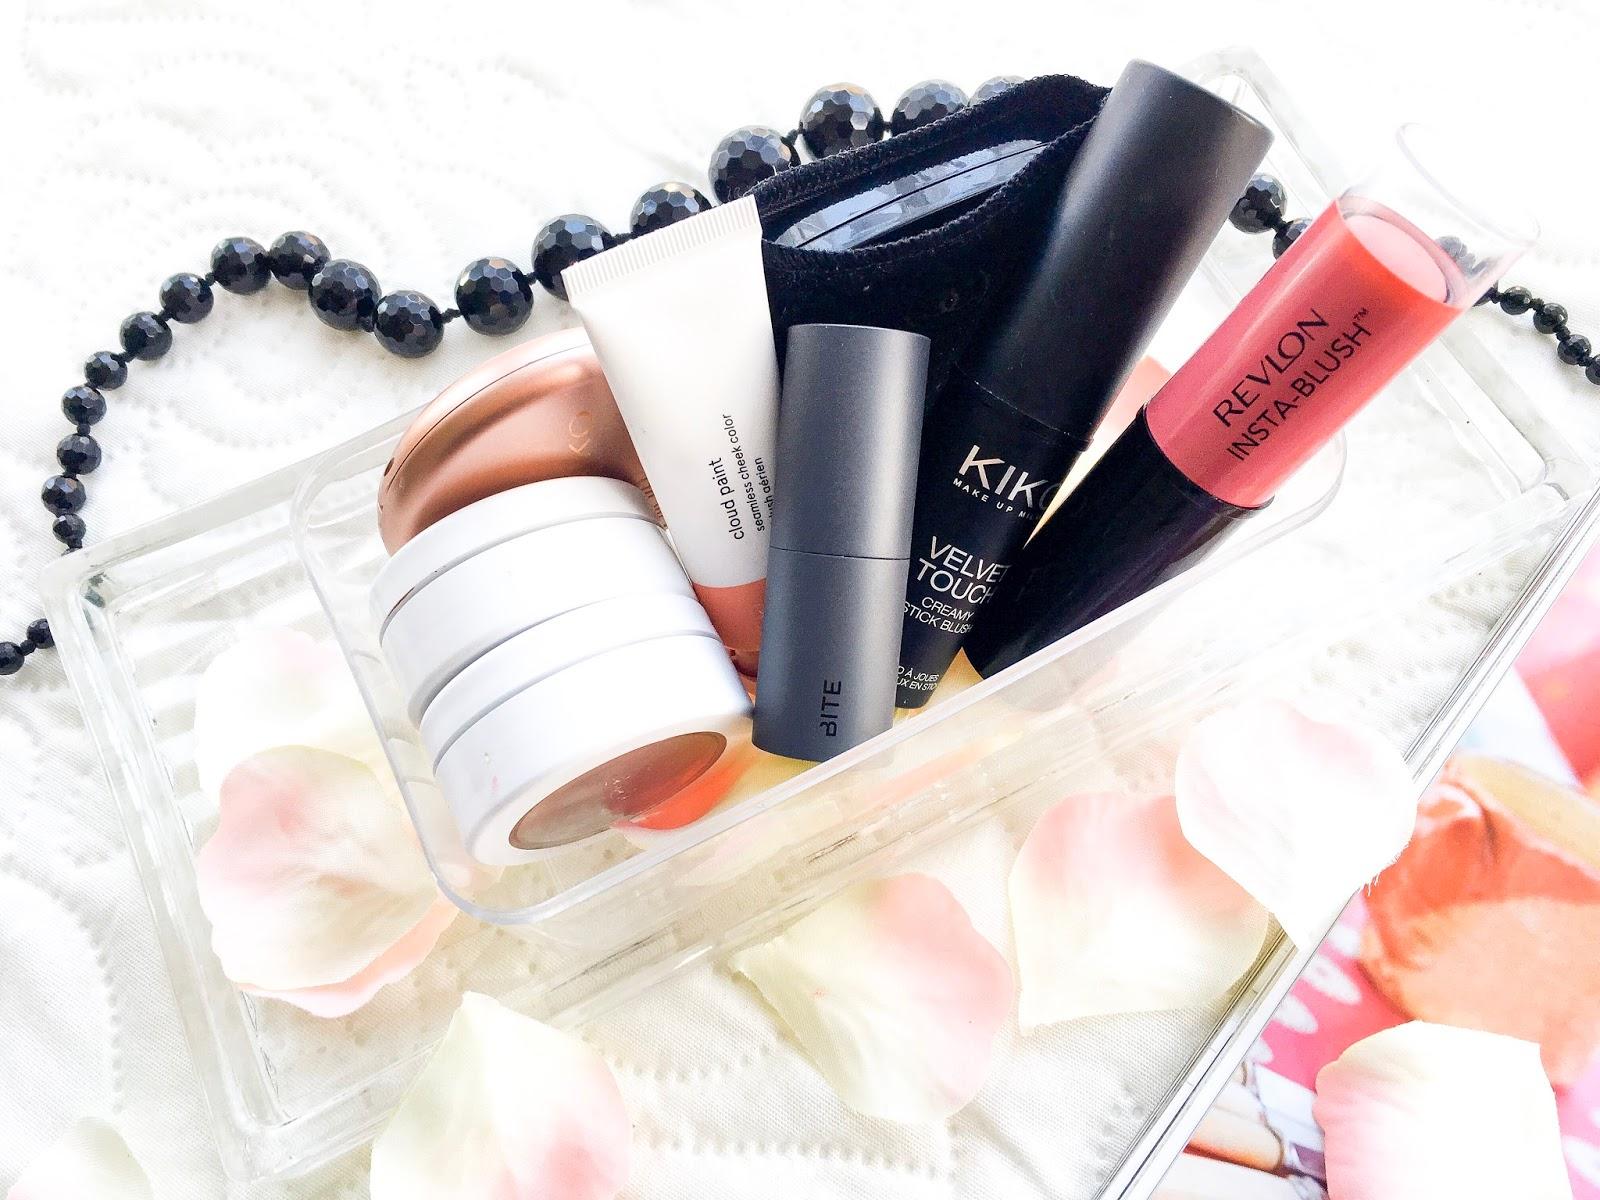 makeup collection series, ummbaby makeup collection series, cream blushers, makeup storage, ferrero rocher makeup storage boxes